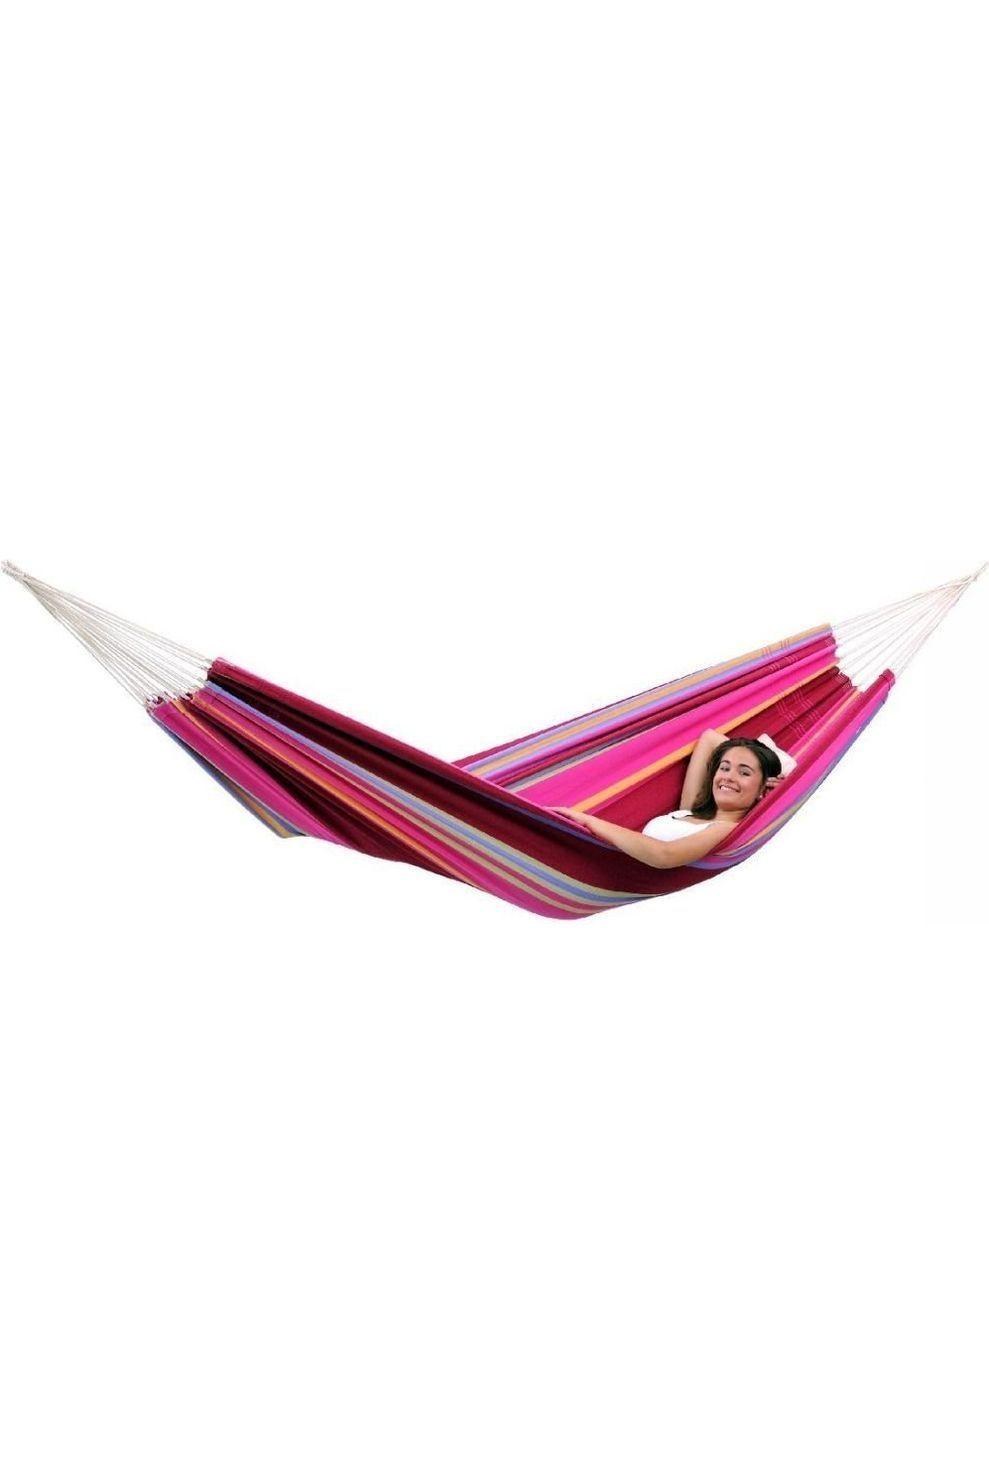 Amazonas Hangmat Barbados - Roze/ Gemengd